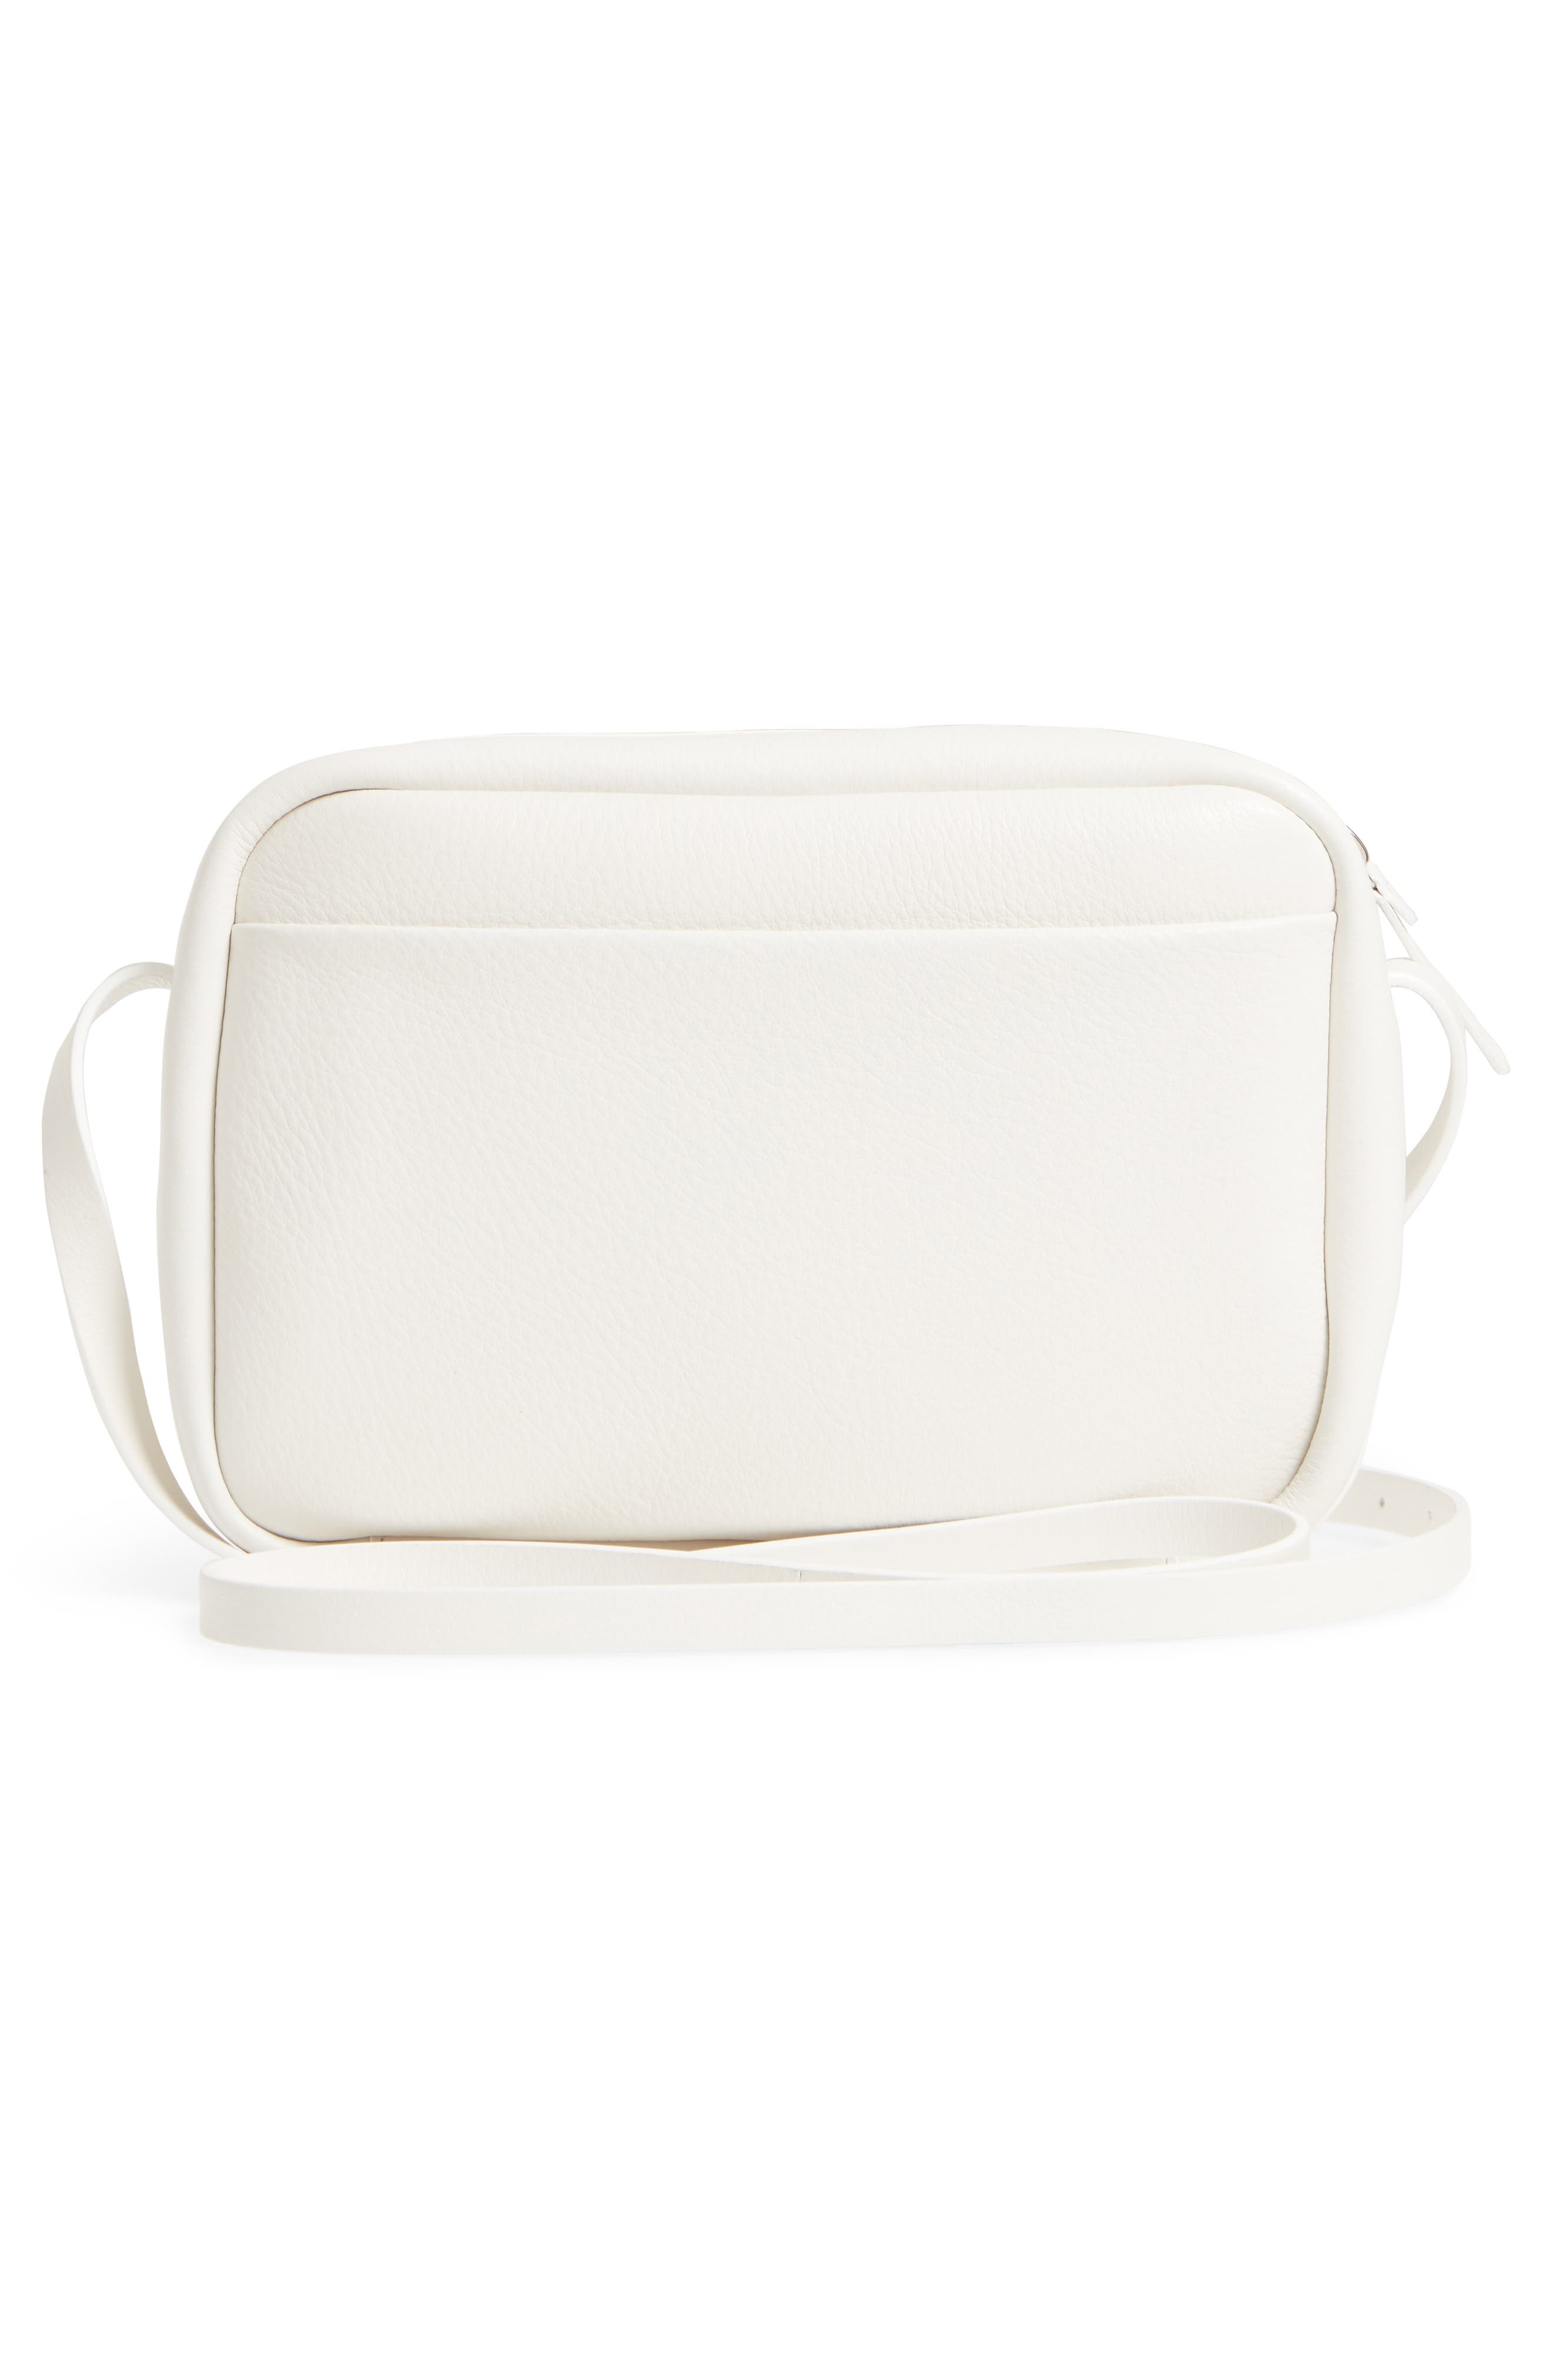 Small Everyday Calfskin Leather Camera Bag,                             Alternate thumbnail 3, color,                             BLANC OPTIQUE/ NOIR